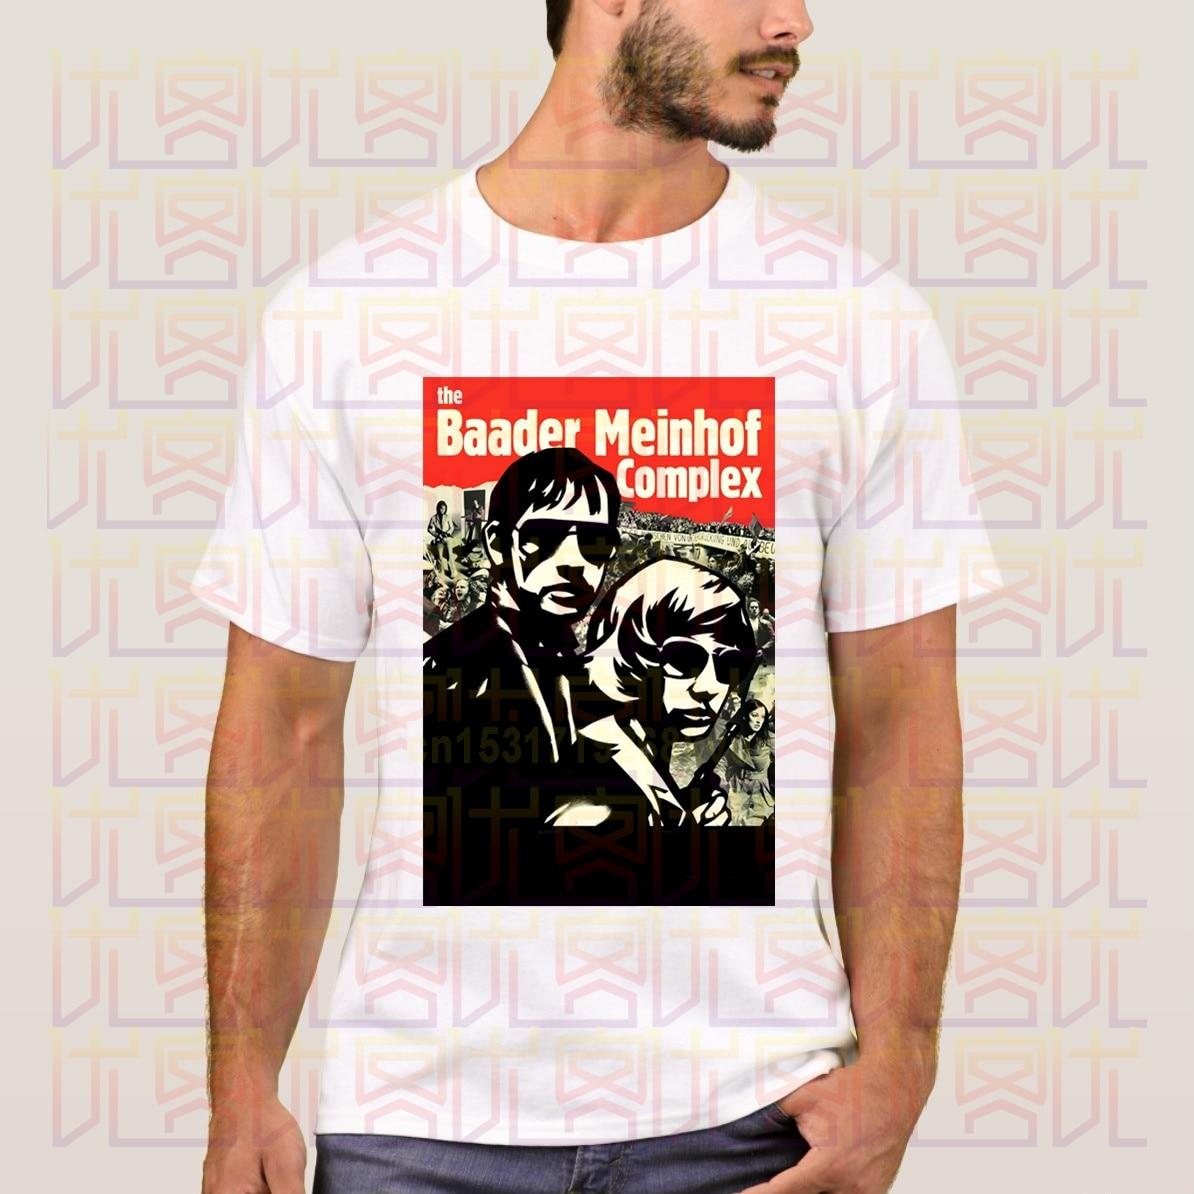 Yeni 2020 yaz RAF kırmızı ordu hizip Logo Baader Meinhof kompleksi 100% pamuklu gündelik tişört Homme Tees Tops S-4XL